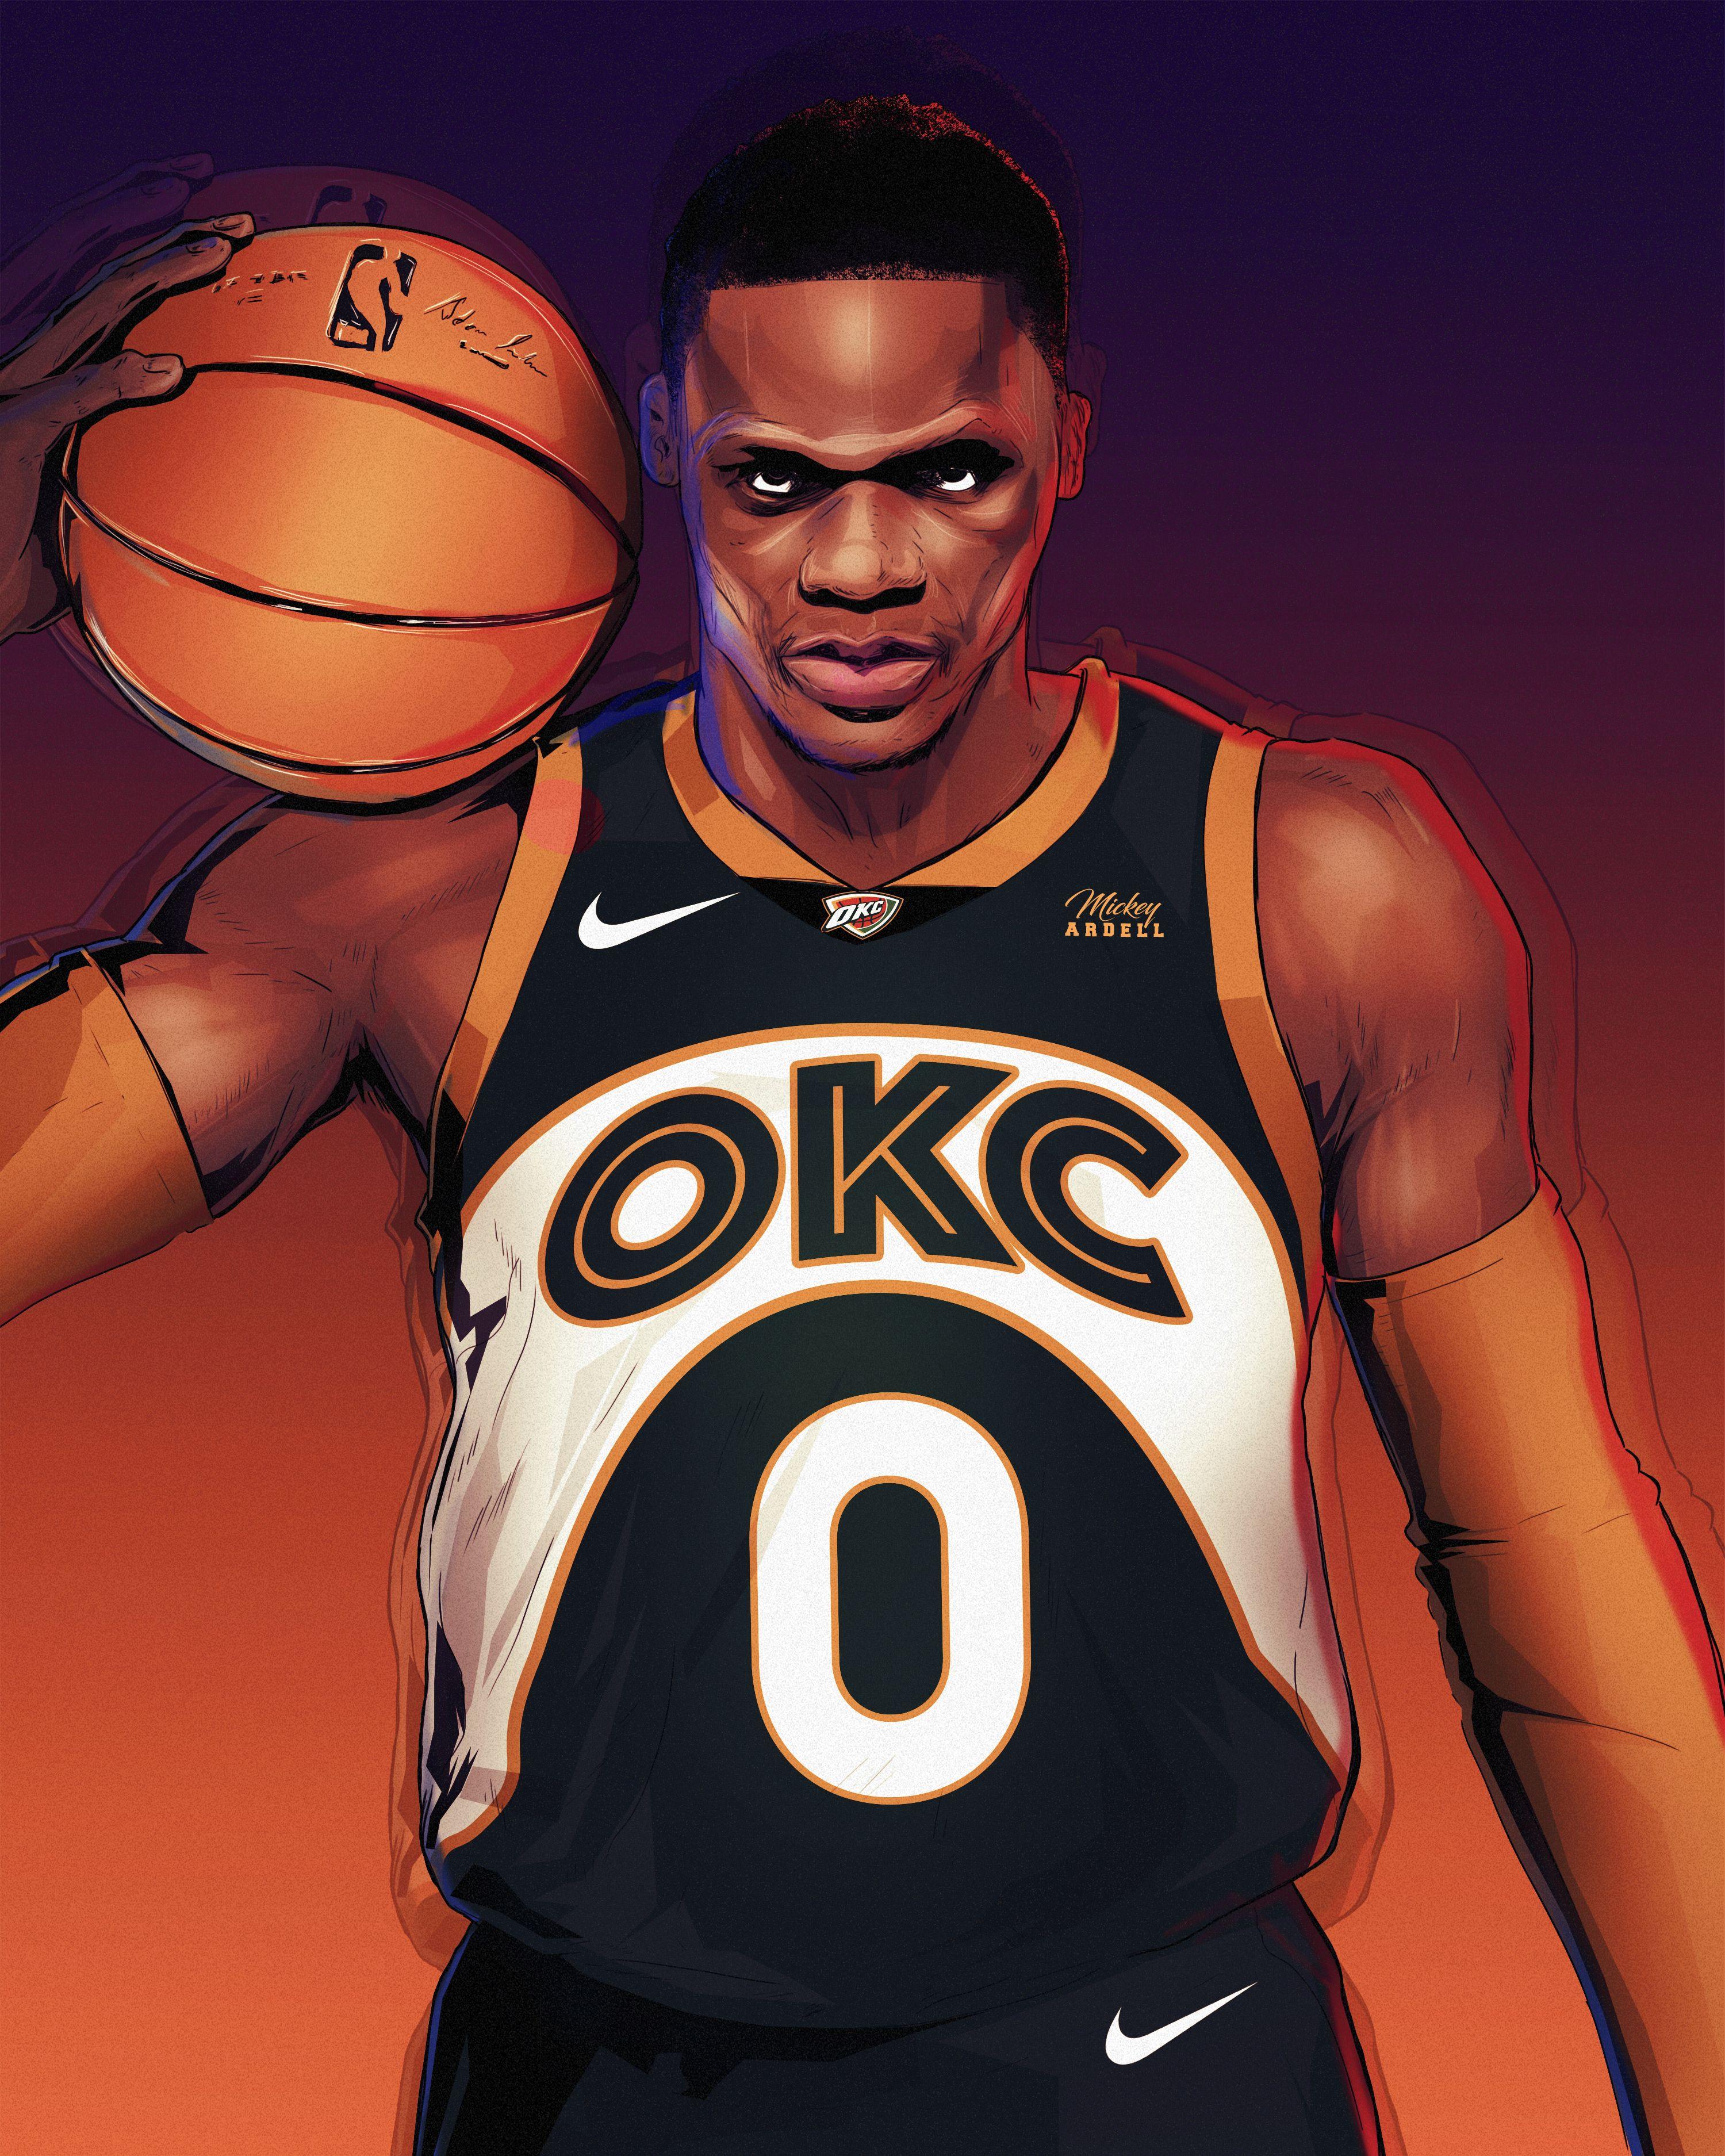 Sonics Okc Jersey Concept Russell Westbrook Nba Art Wmcskills Nba Art Sports Basketball Westbrook Nba